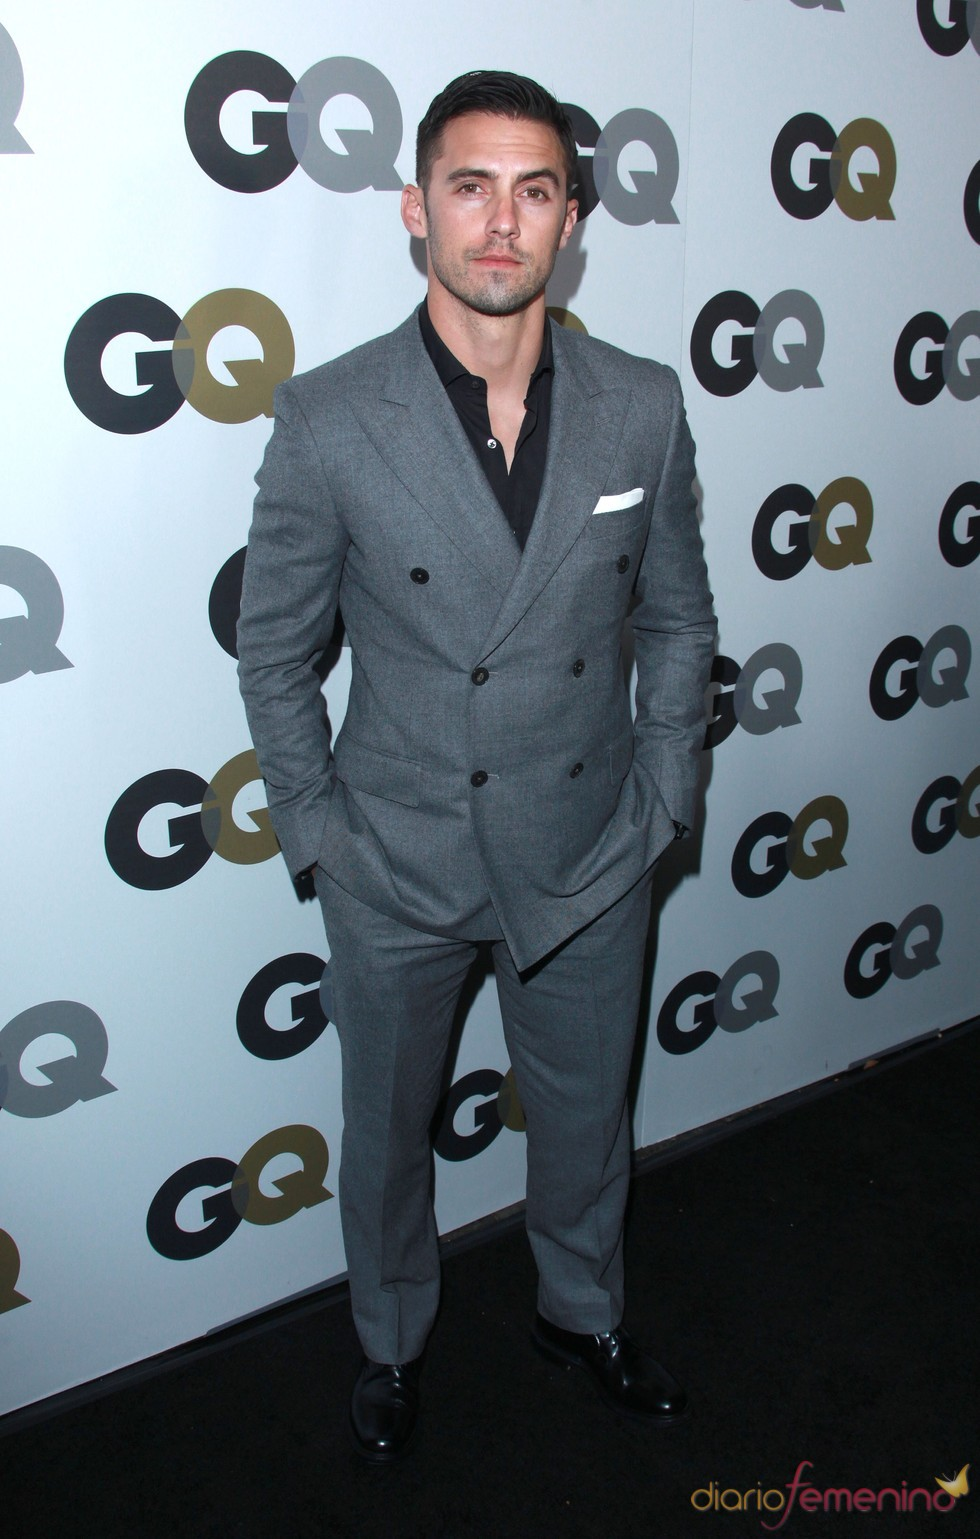 Milo Ventimiglia en la Fiesta GQ 2010